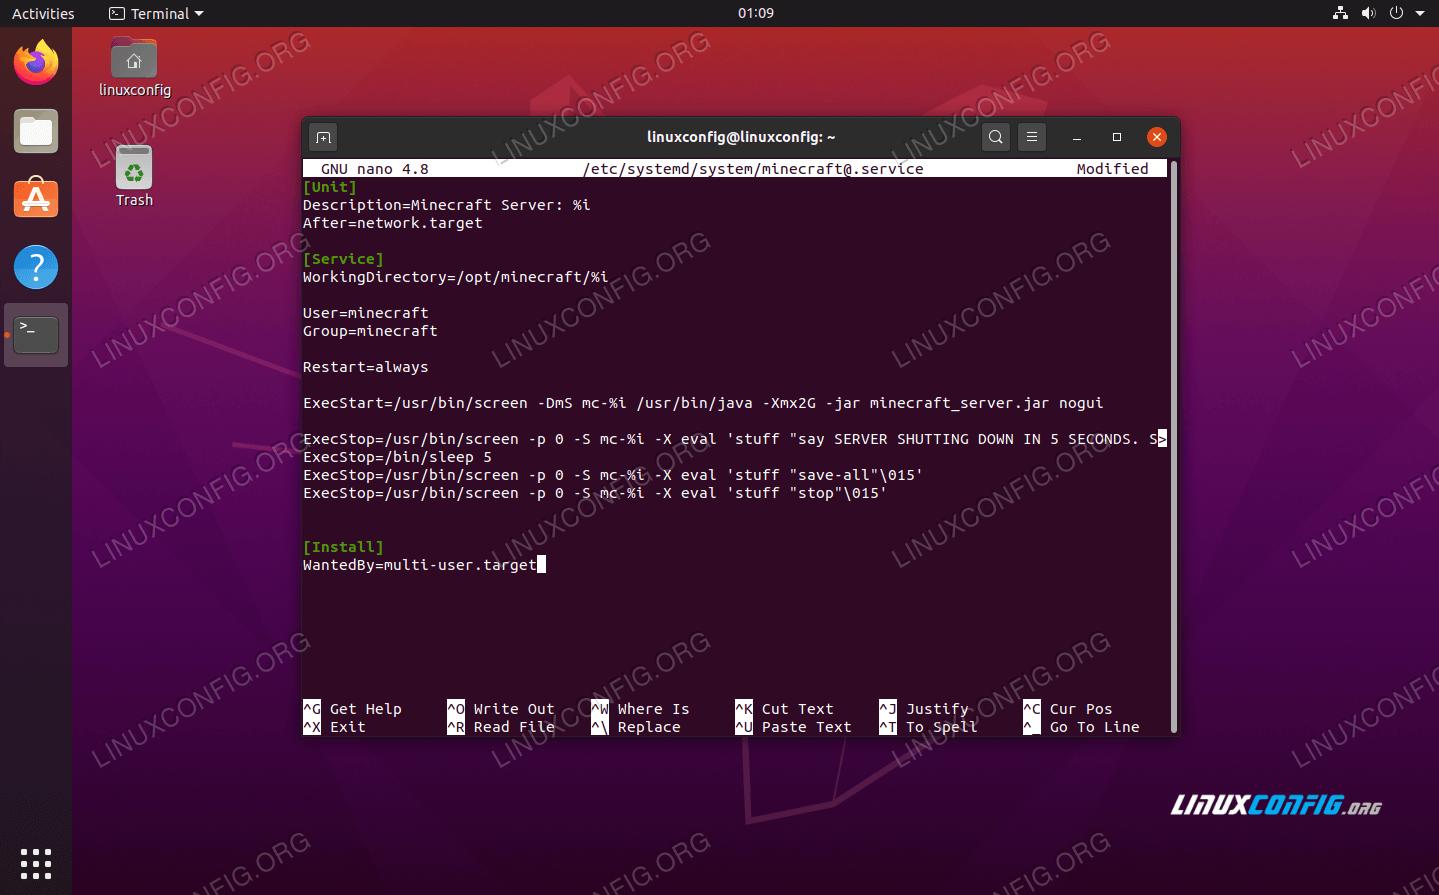 SystemD script for Minecraft